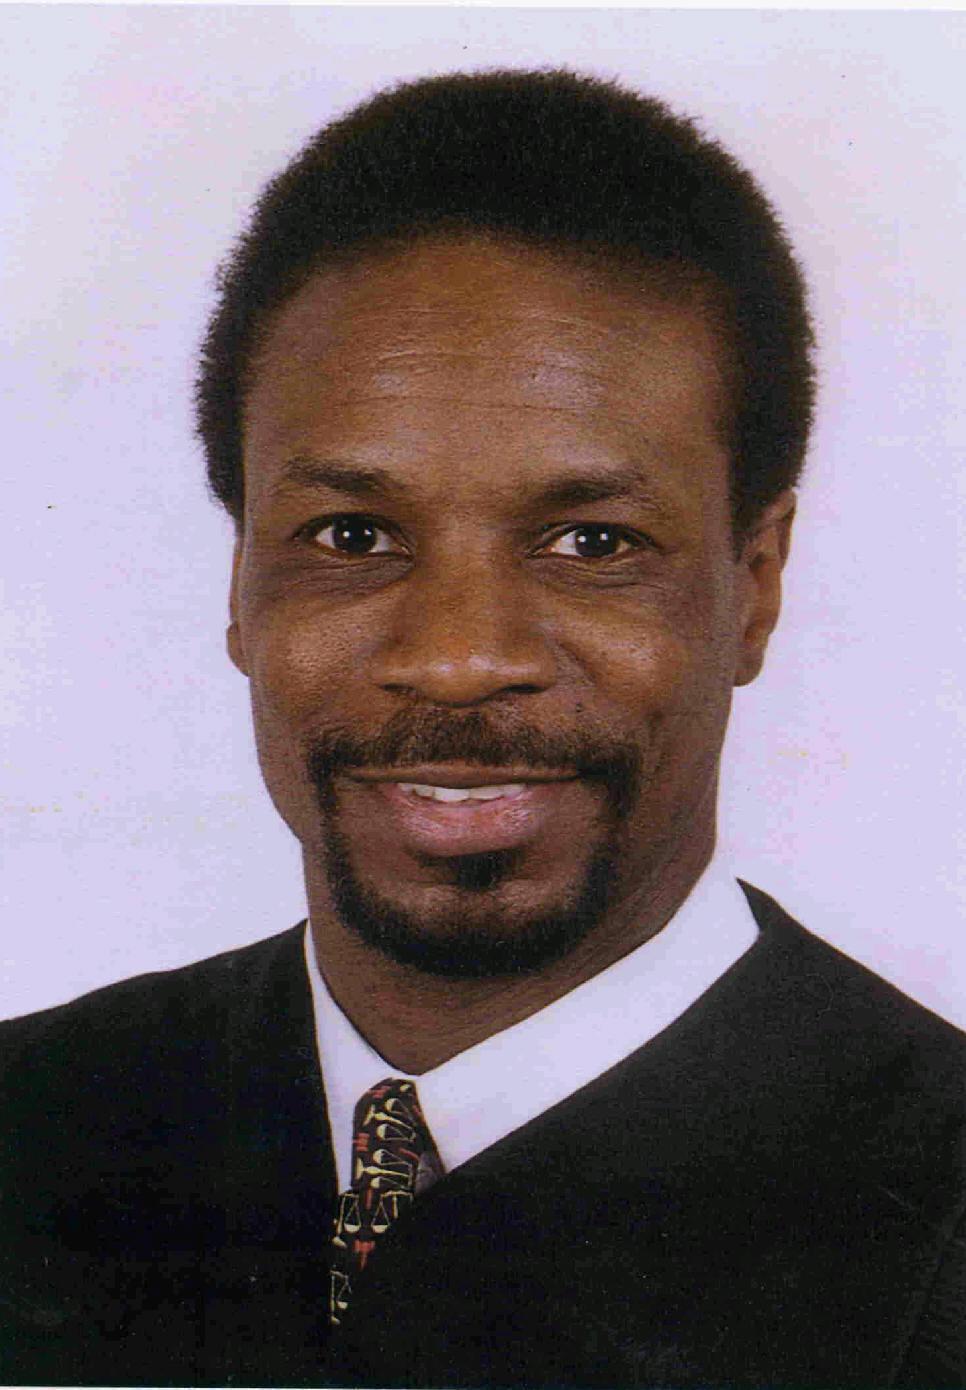 FLINT 67th DISTRICT JUDGE HERMAN MARABLE, JR.